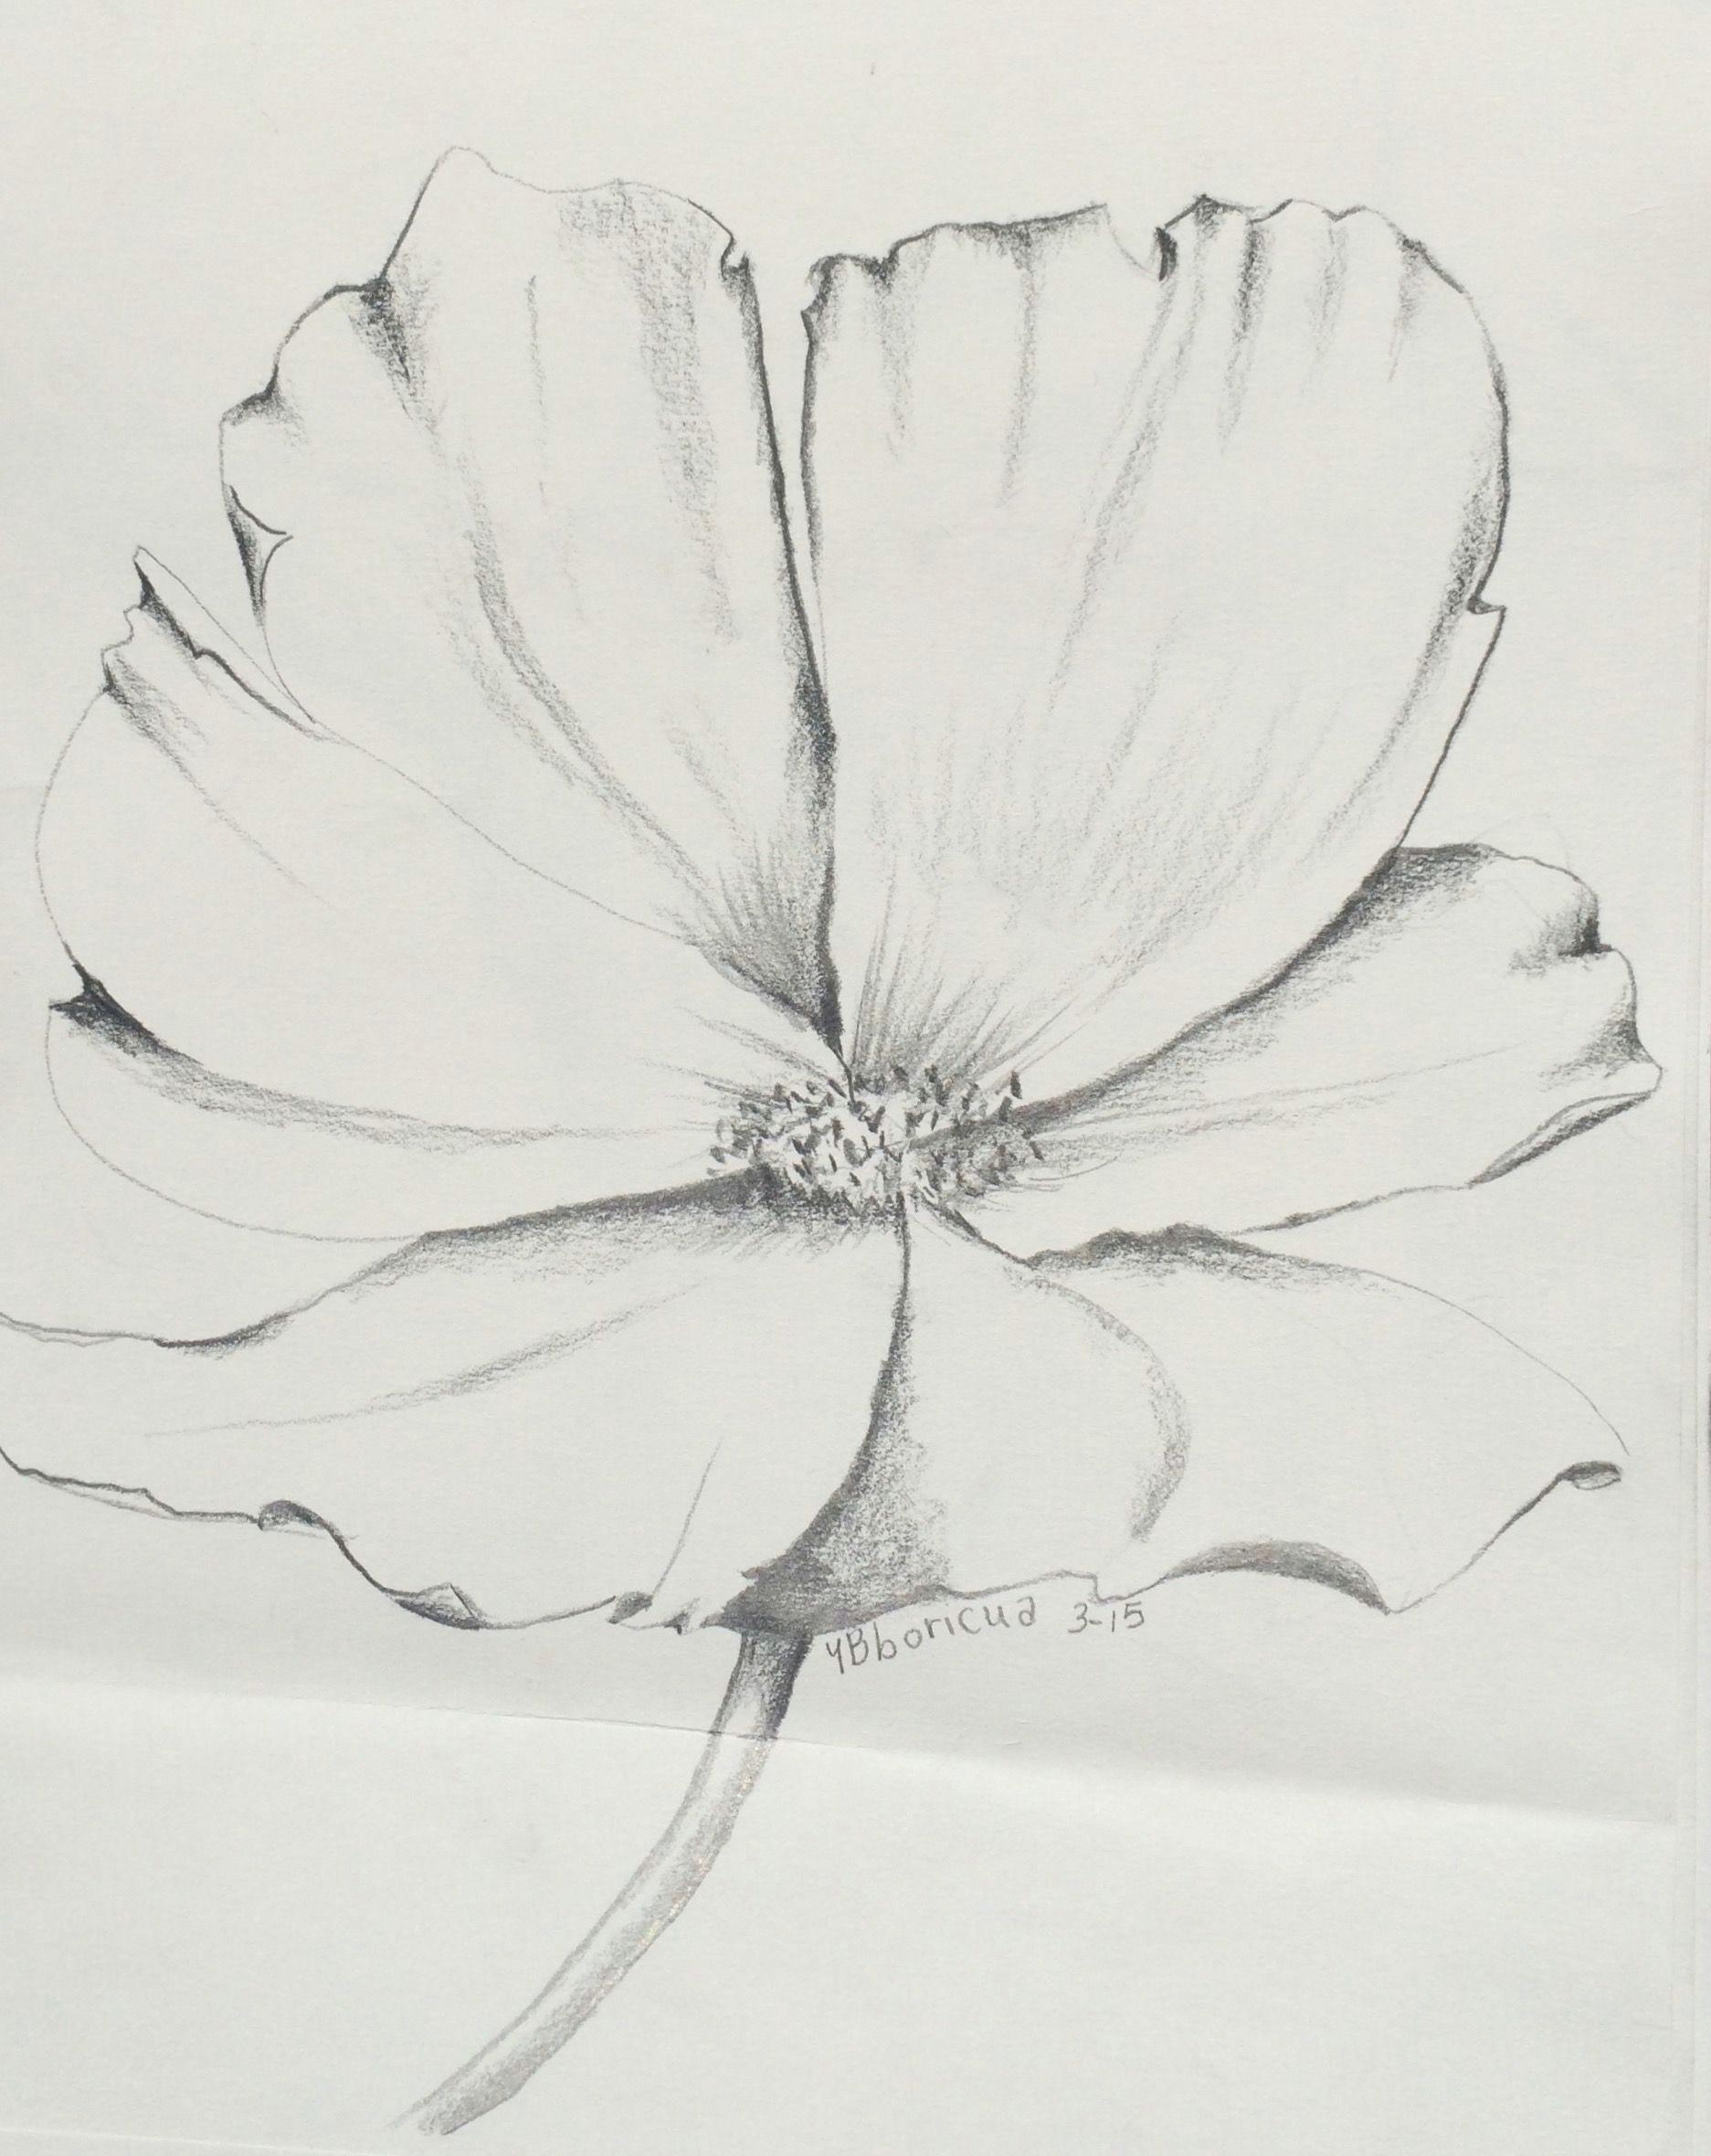 flower 7 artist ybboricua description original pencil drawing march 18 3015